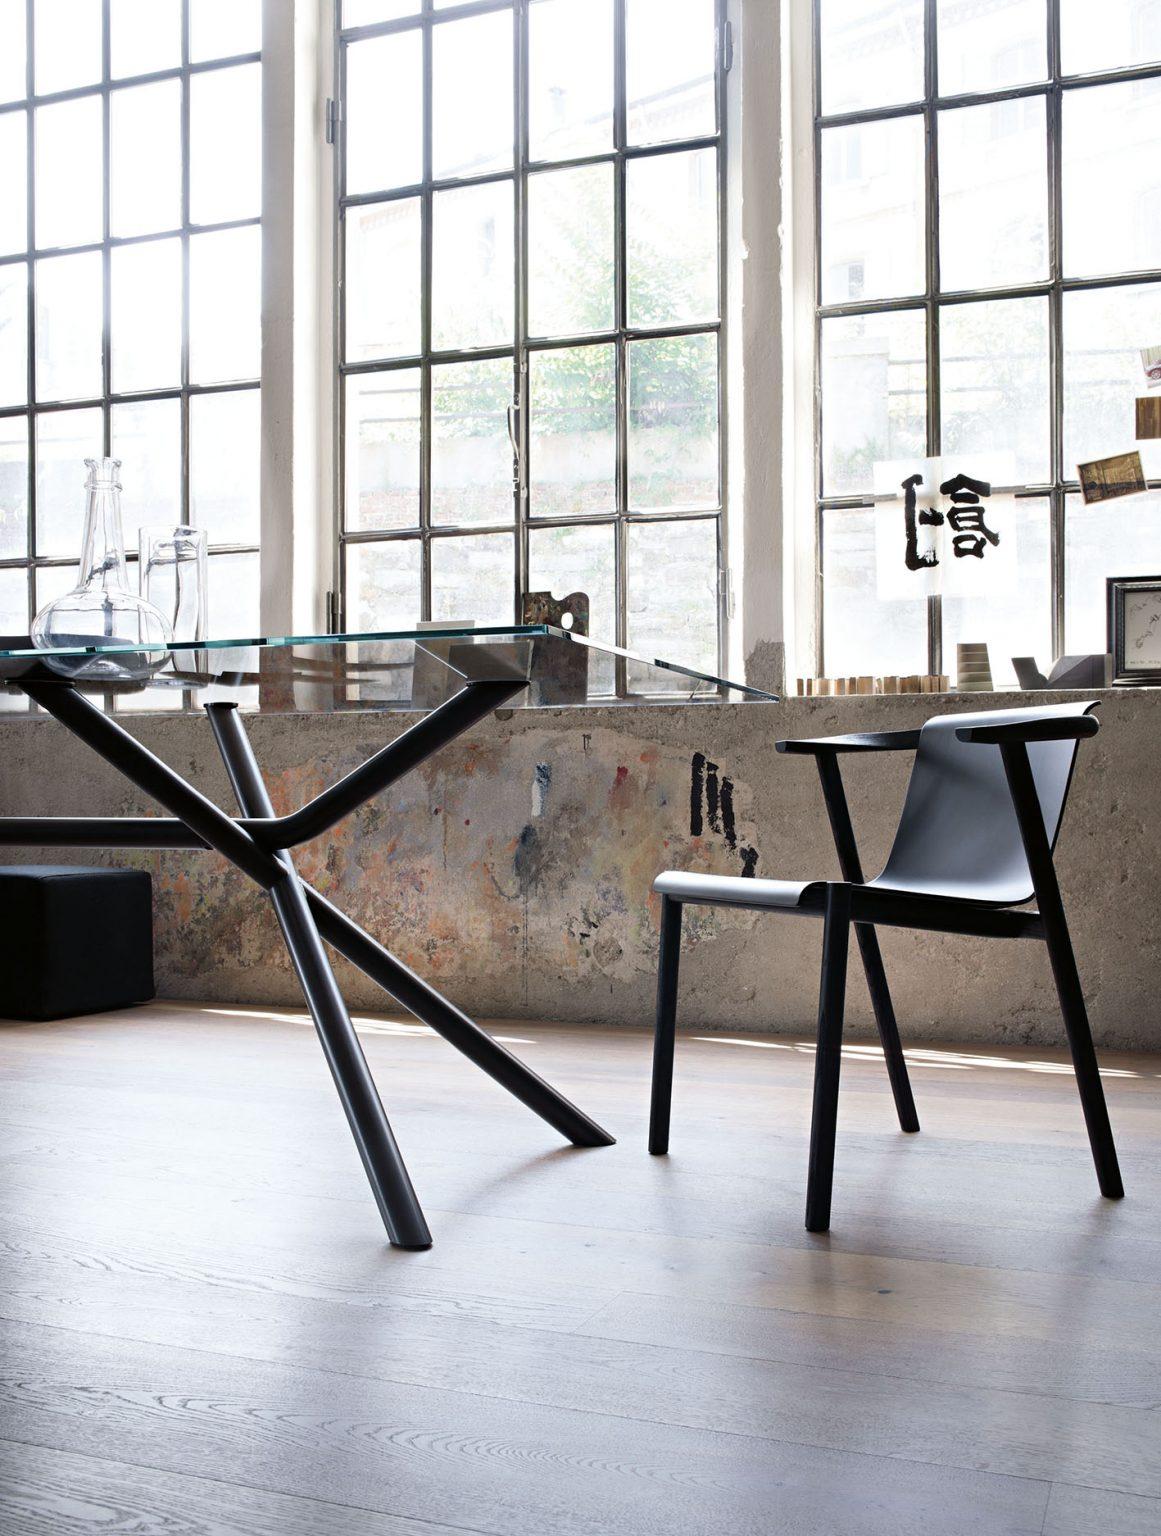 Biennale Interieur - Belgium's leading design and interior event - Lema-bai-lu-chair-neri-hu-2.jpg